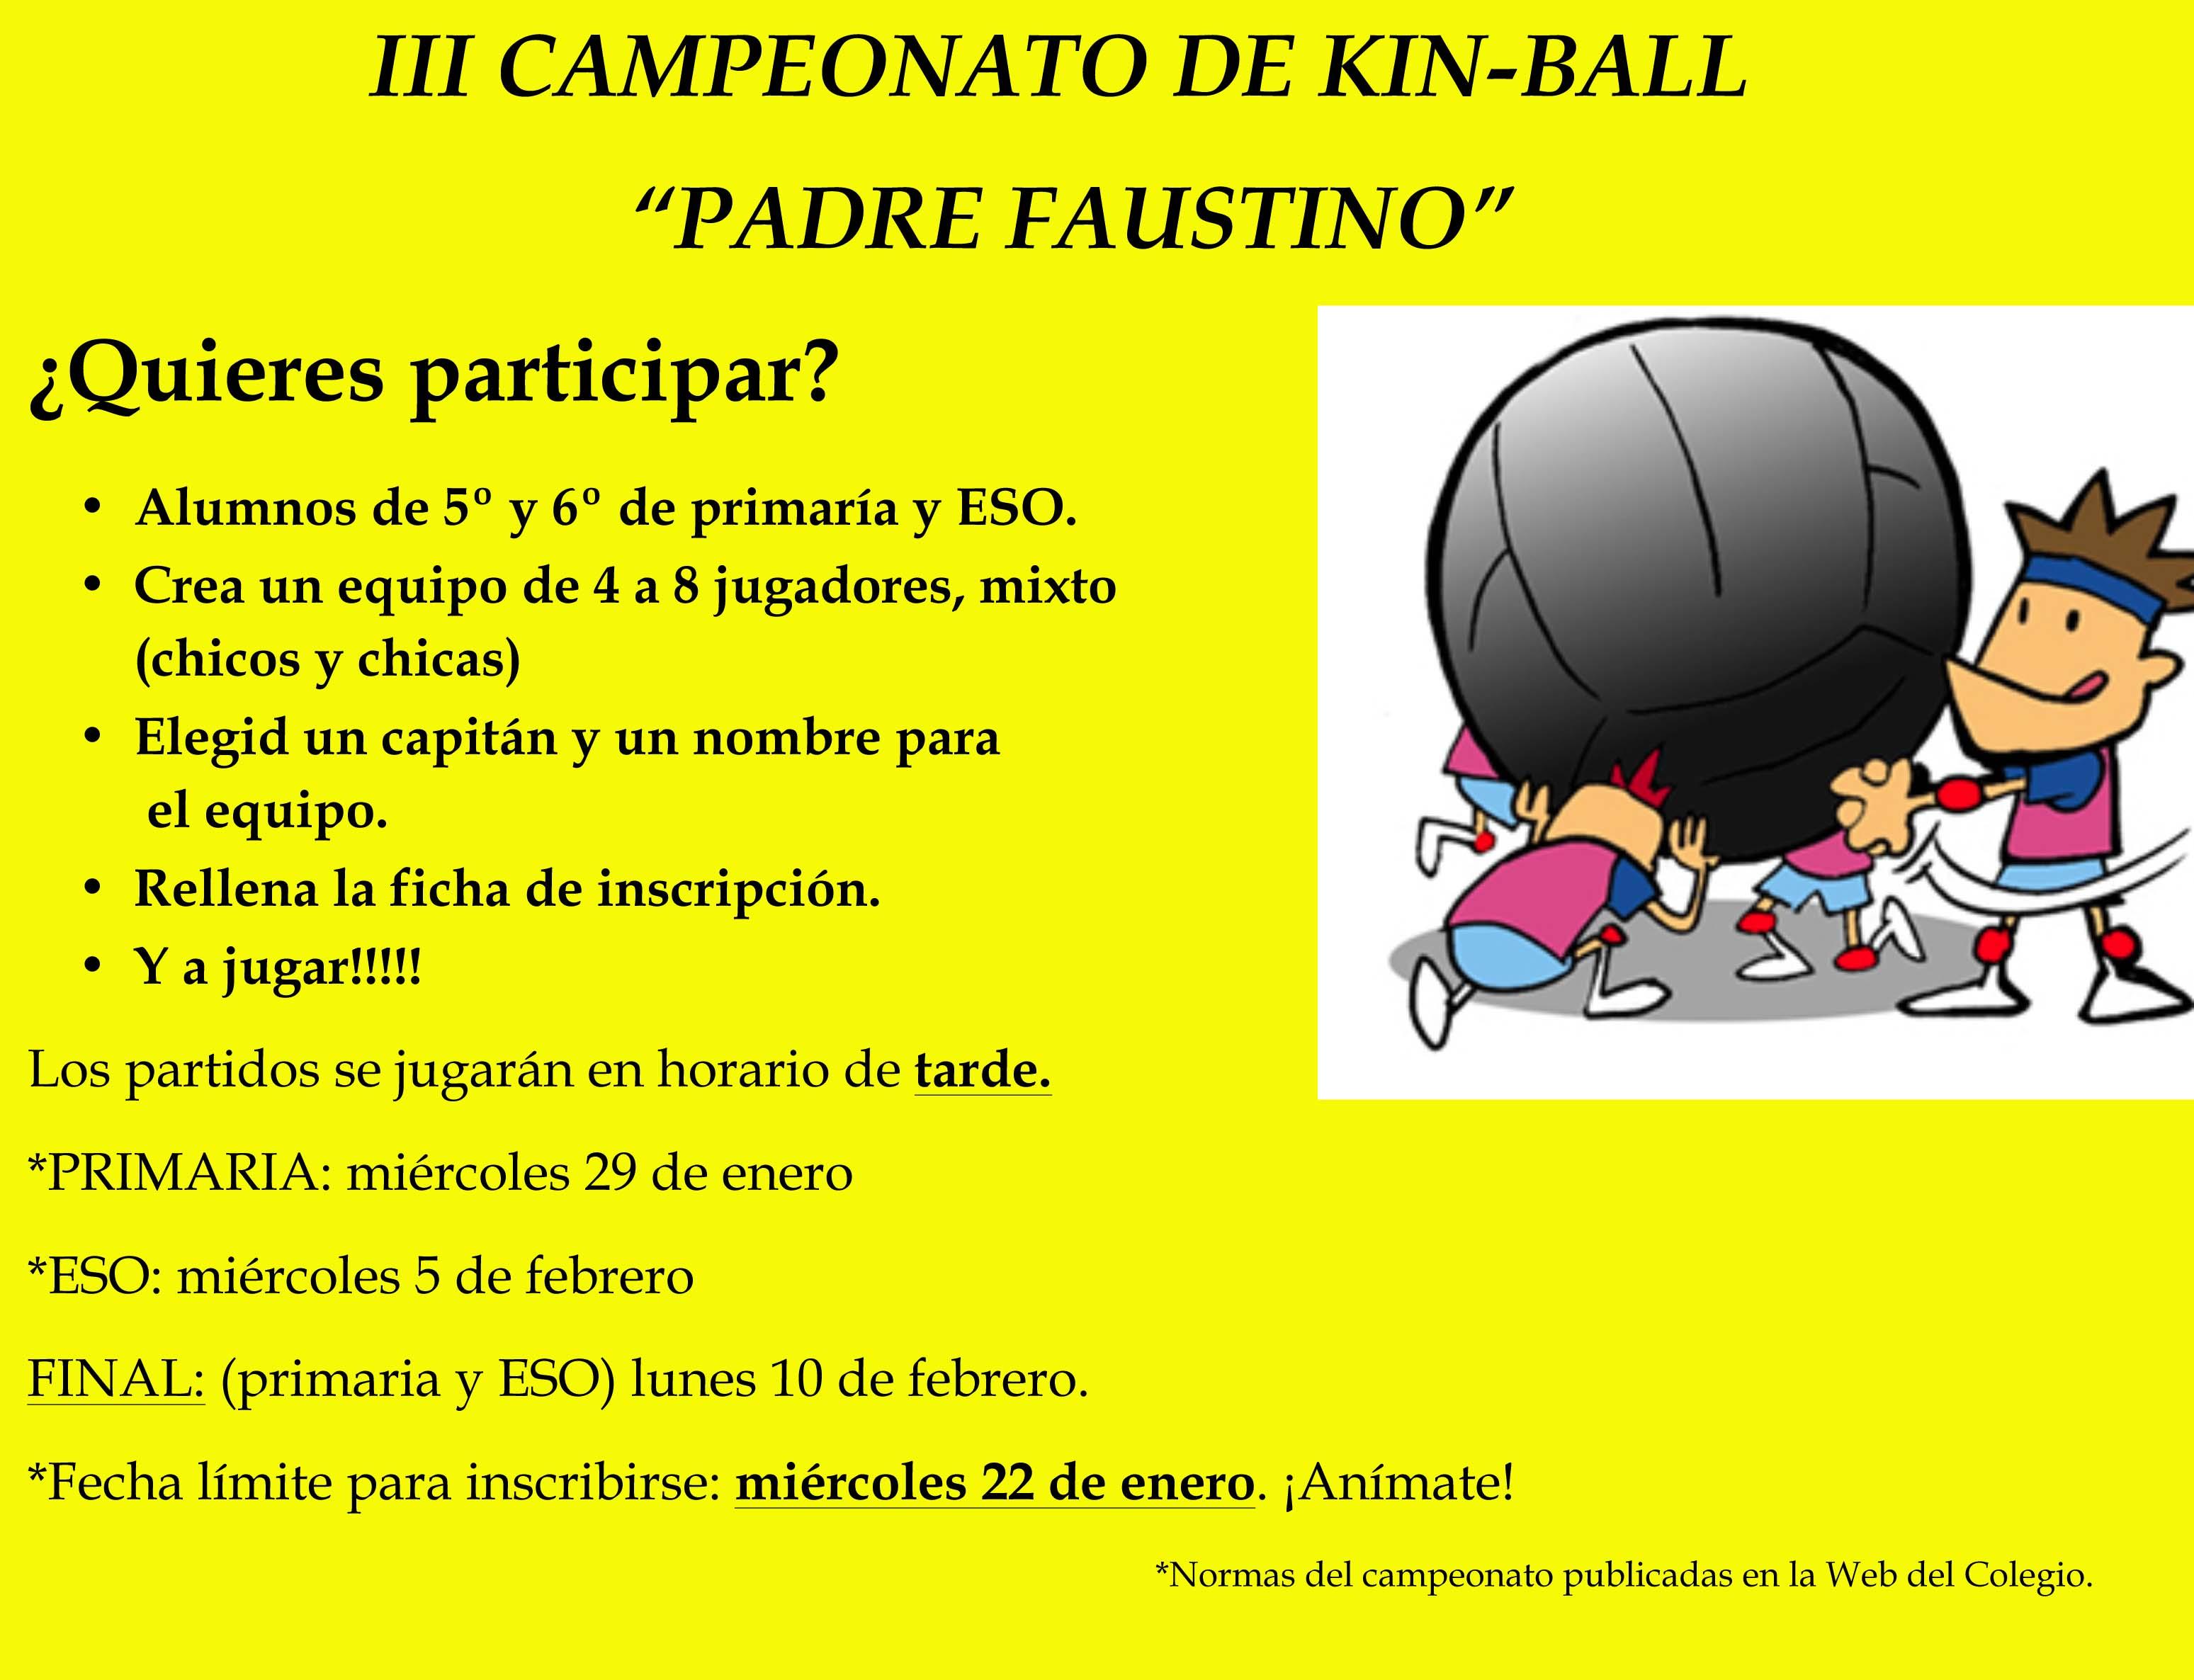 Microsoft Word - Cartel III Cto de Kin ball.docx